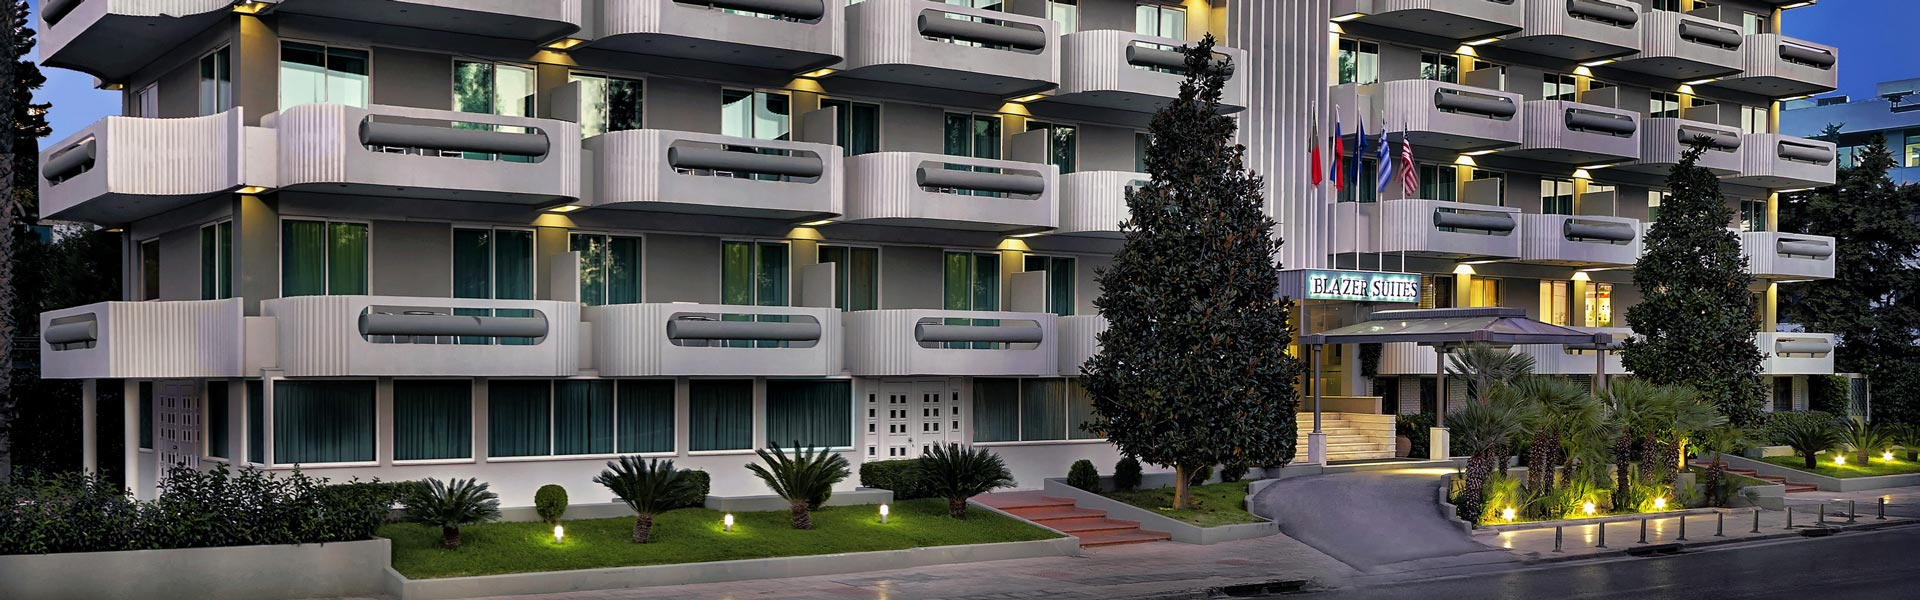 Blazer Suites Hotel Glyfada